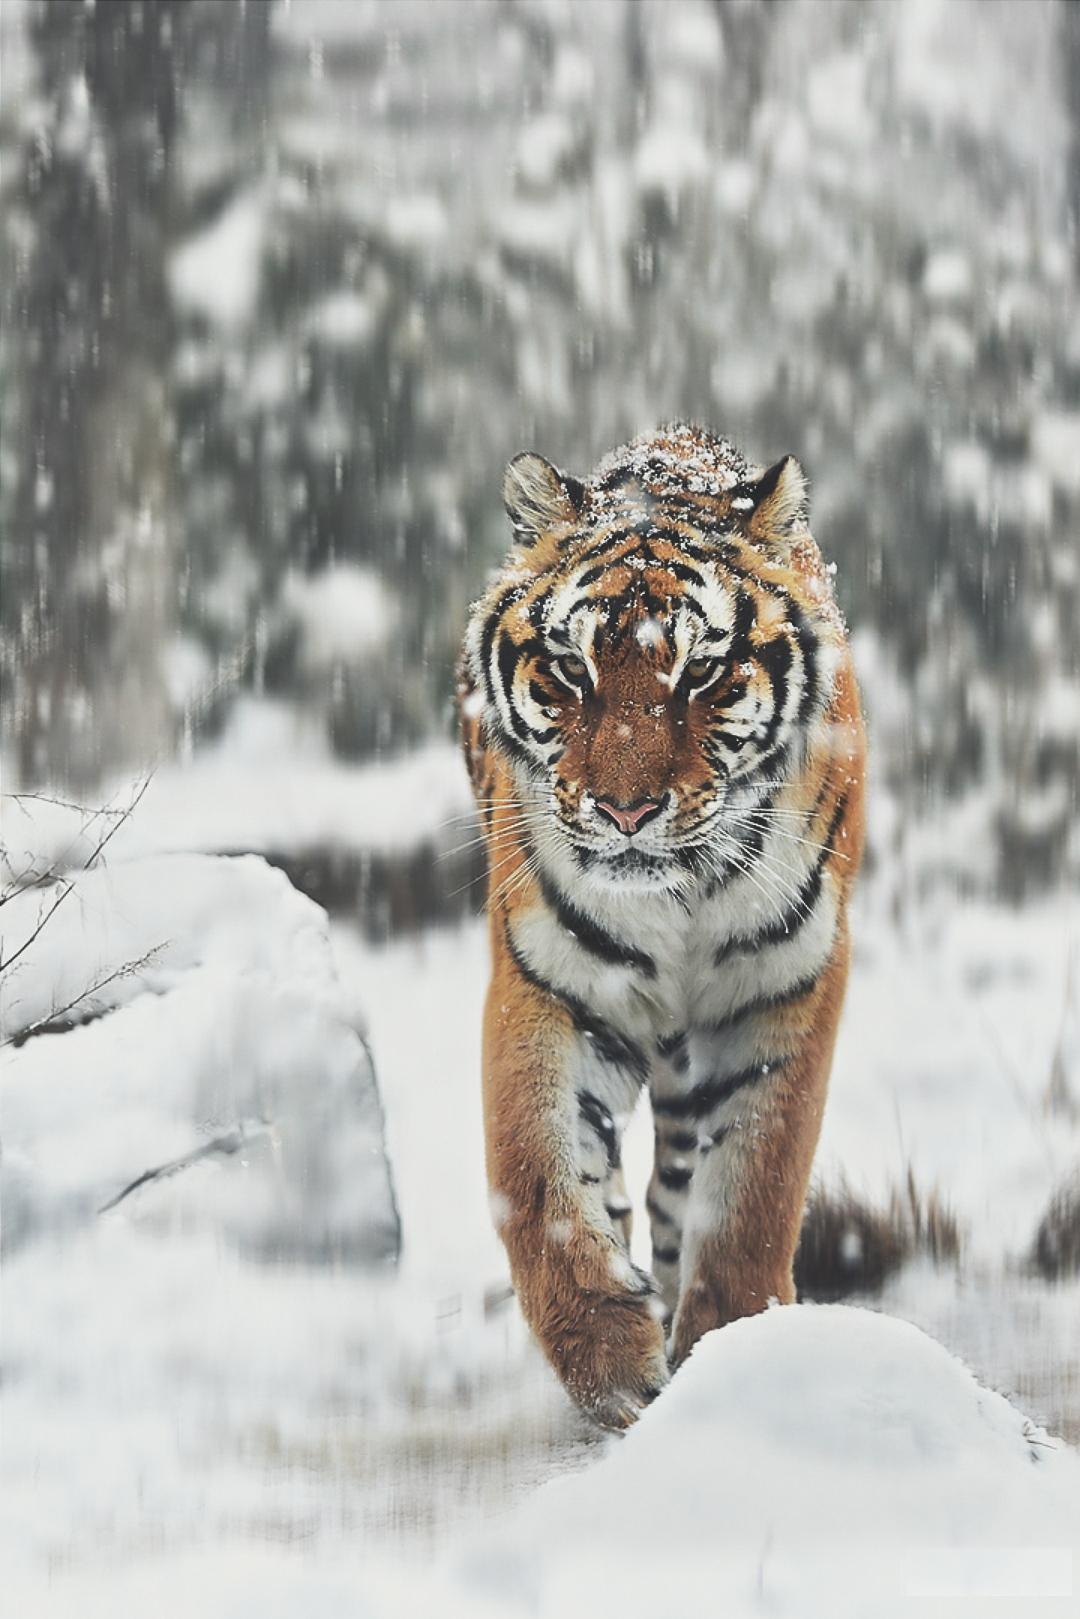 tiger big cat predator fur animal mammal wildlife wild